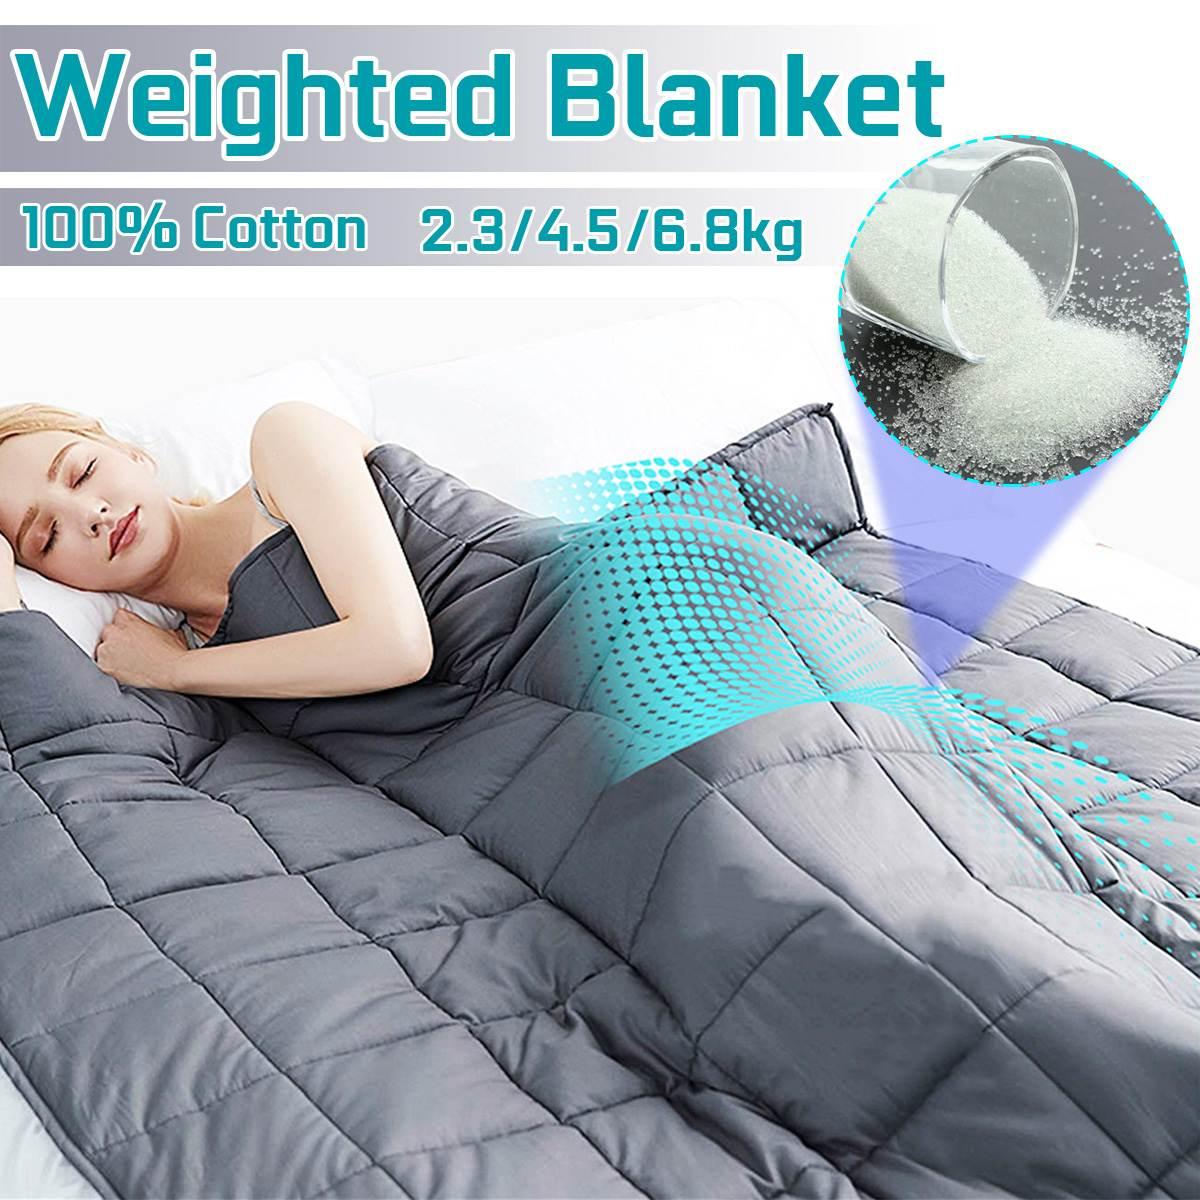 Weighted Blanket For Adult Blankets Decompression Sleep Aid Pressure Sleeping Blanket Heavy Blanket Throw Blanket Bed